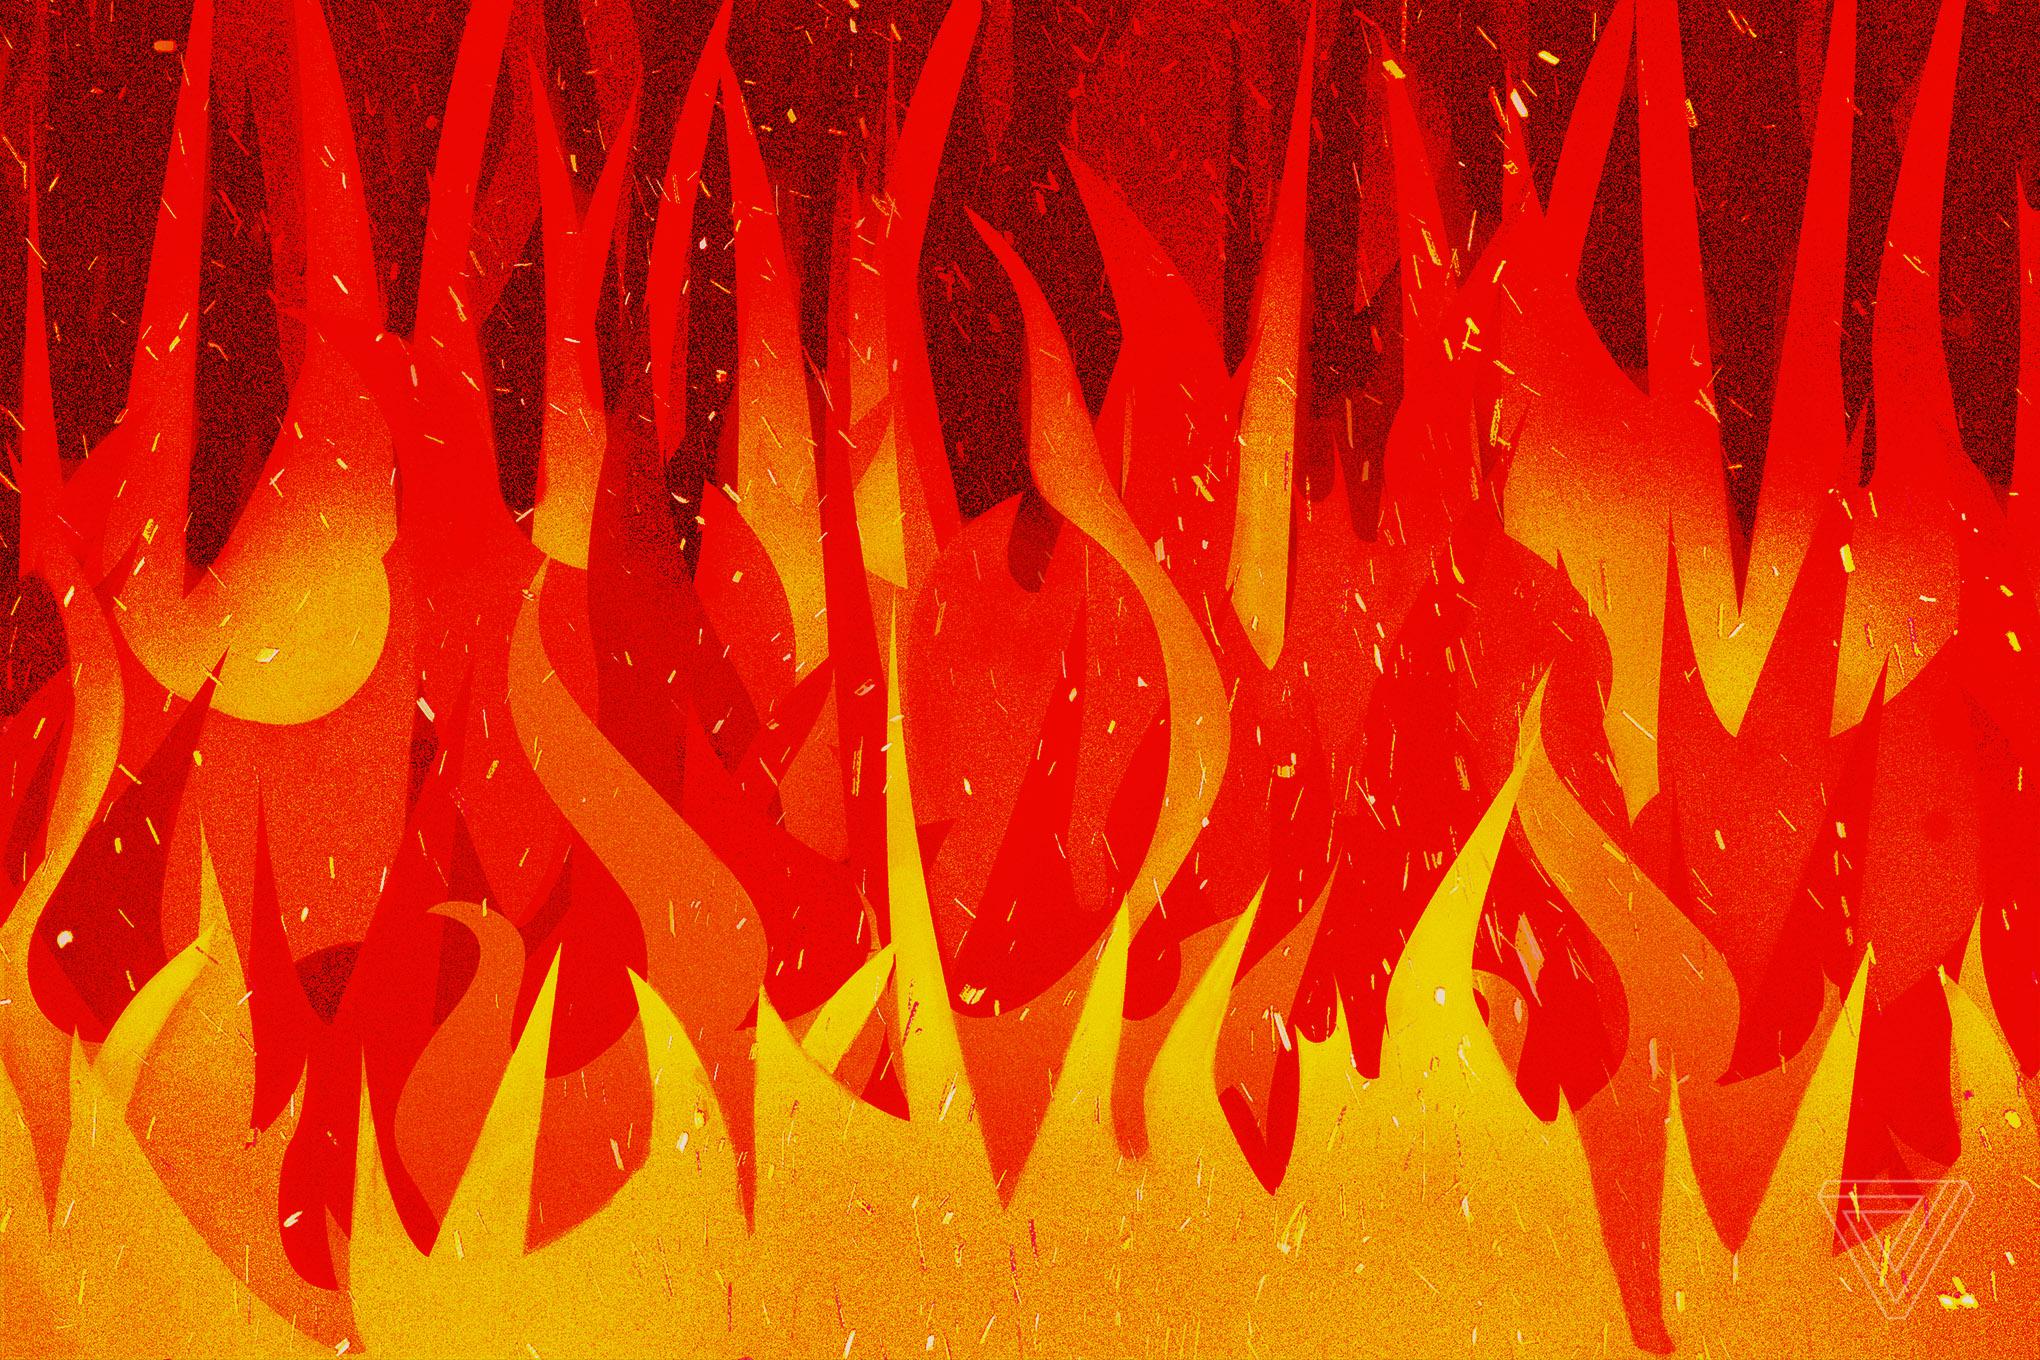 fire stock illustrations